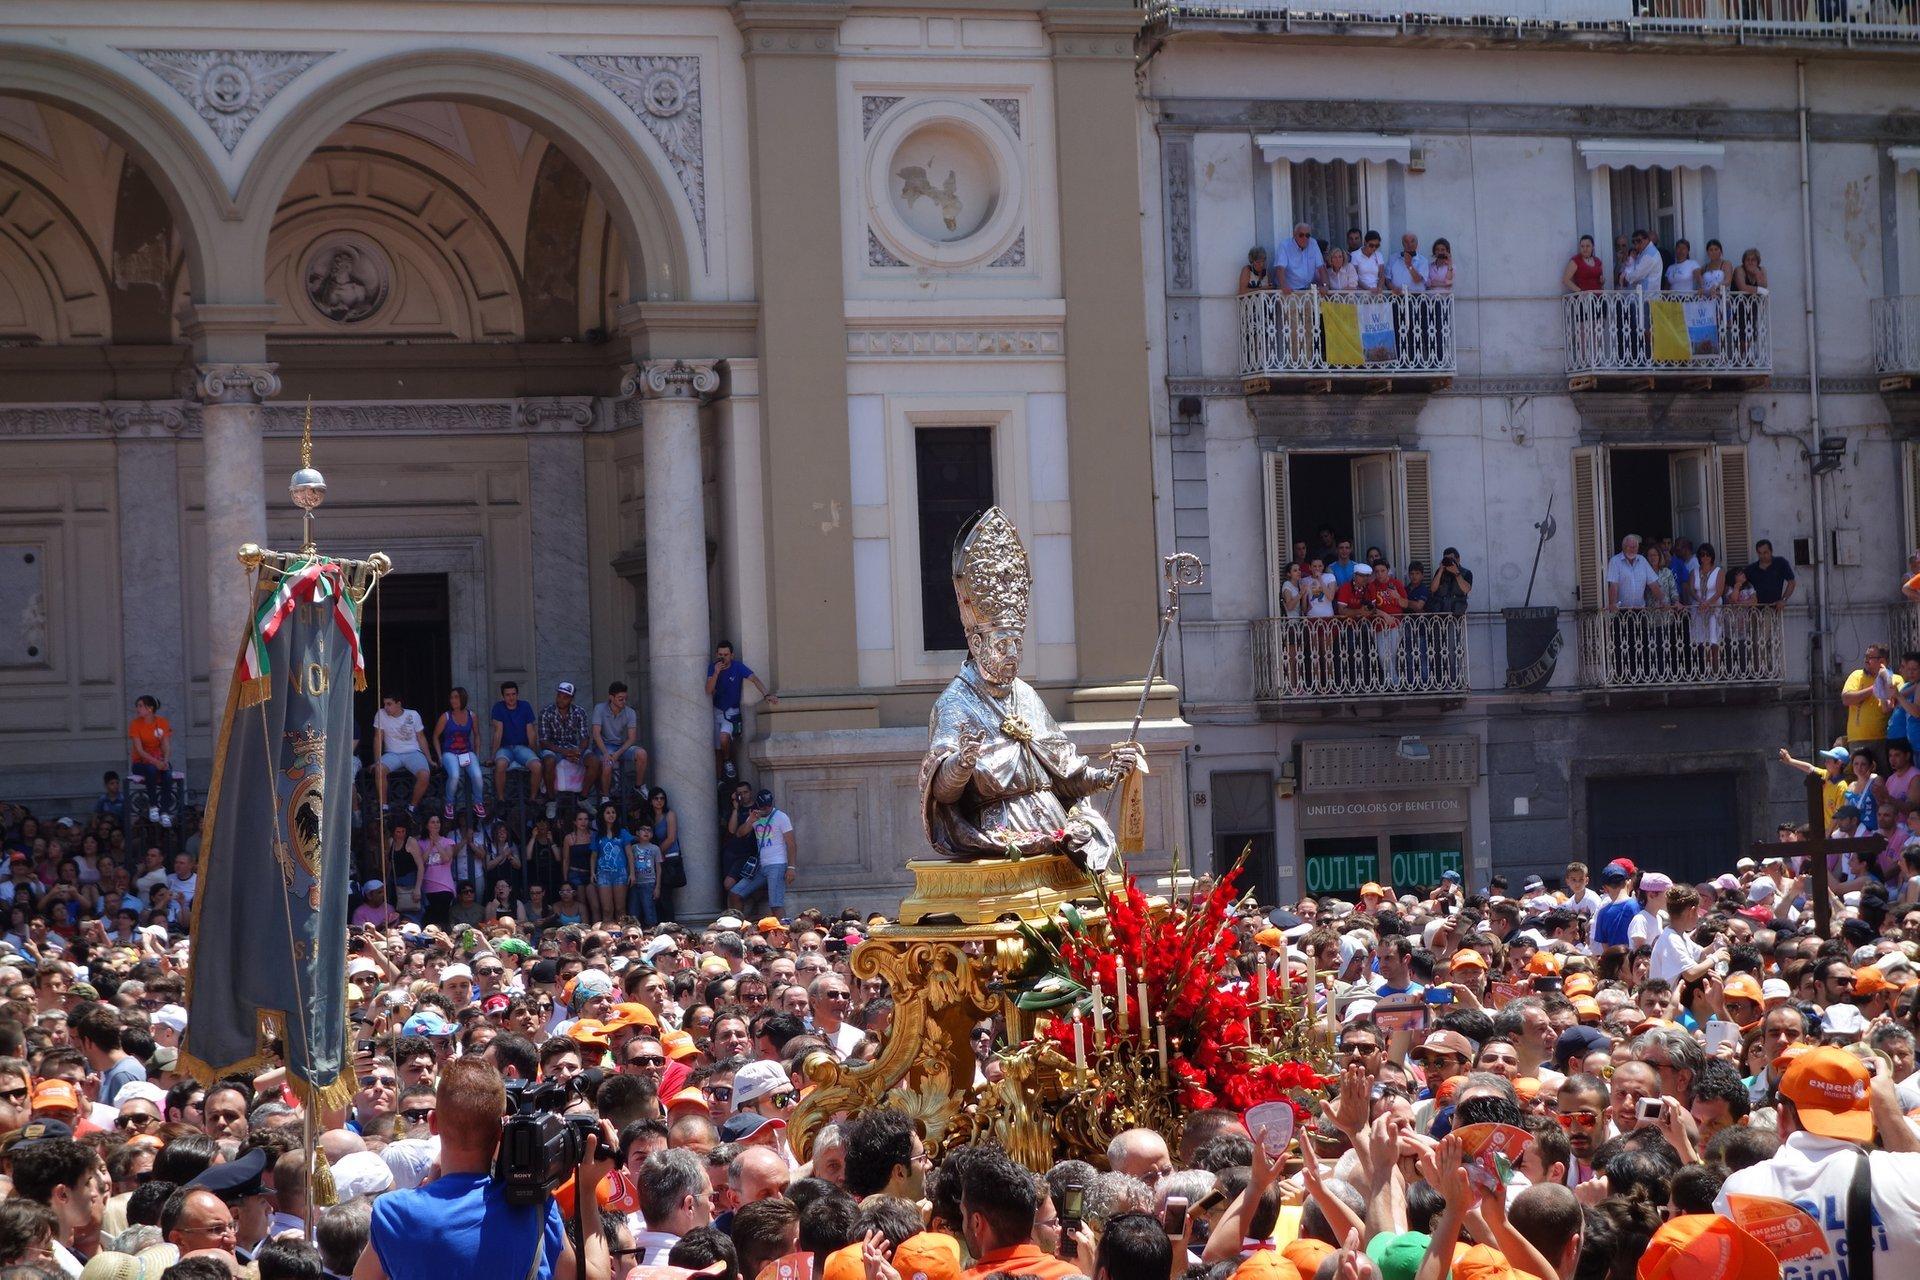 Festa dei Gigli in Nola in Naples and Pompeii 2020 - Best Time